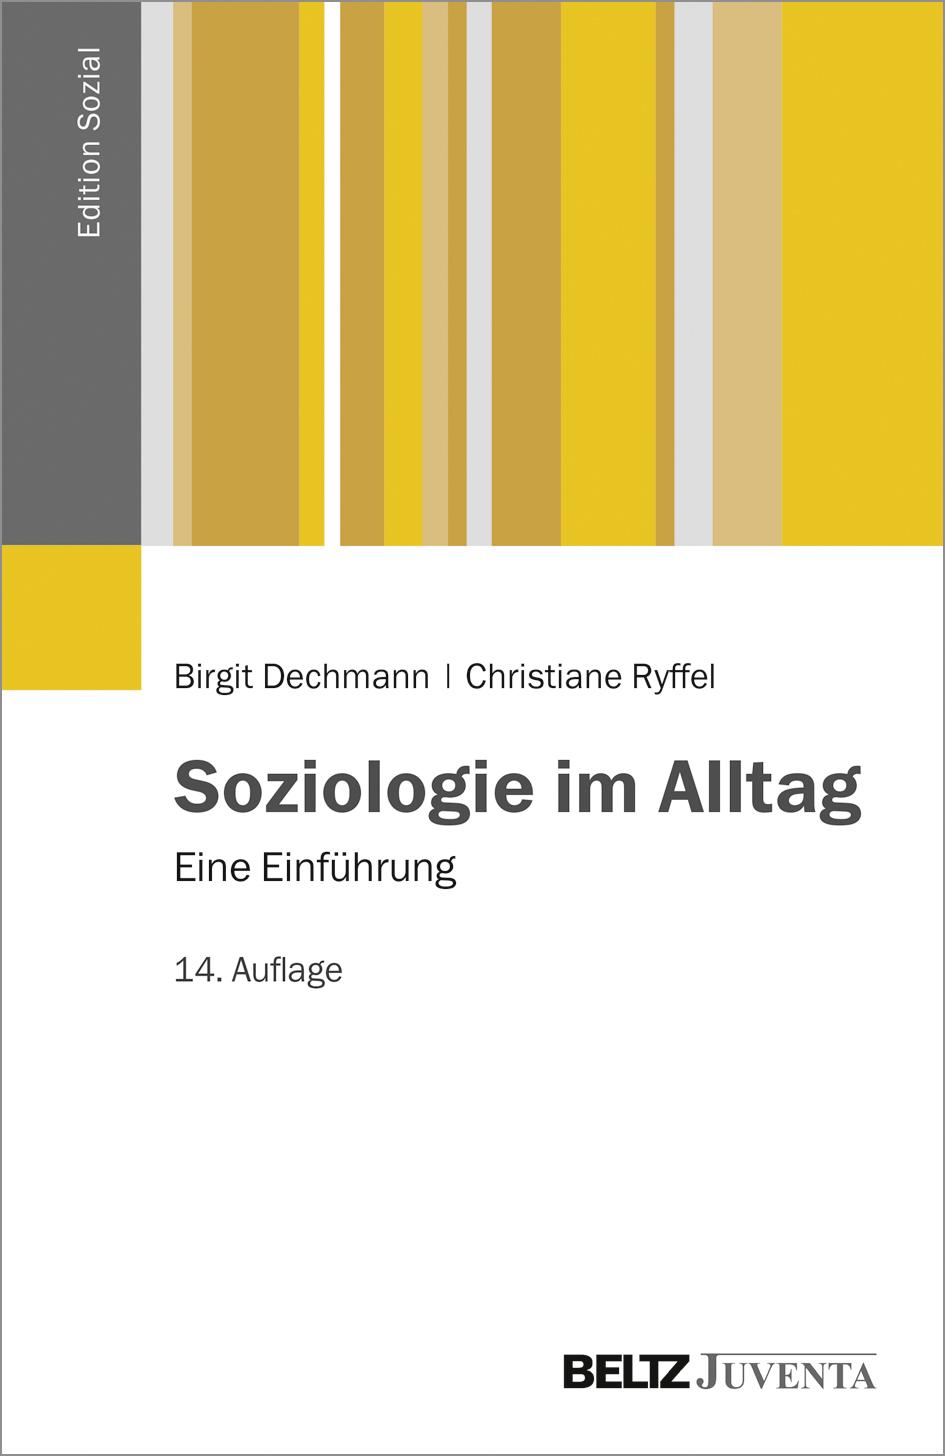 Erfreut Alltags Mathe Arbeitsblatt Zeitgenössisch - Super Lehrer ...